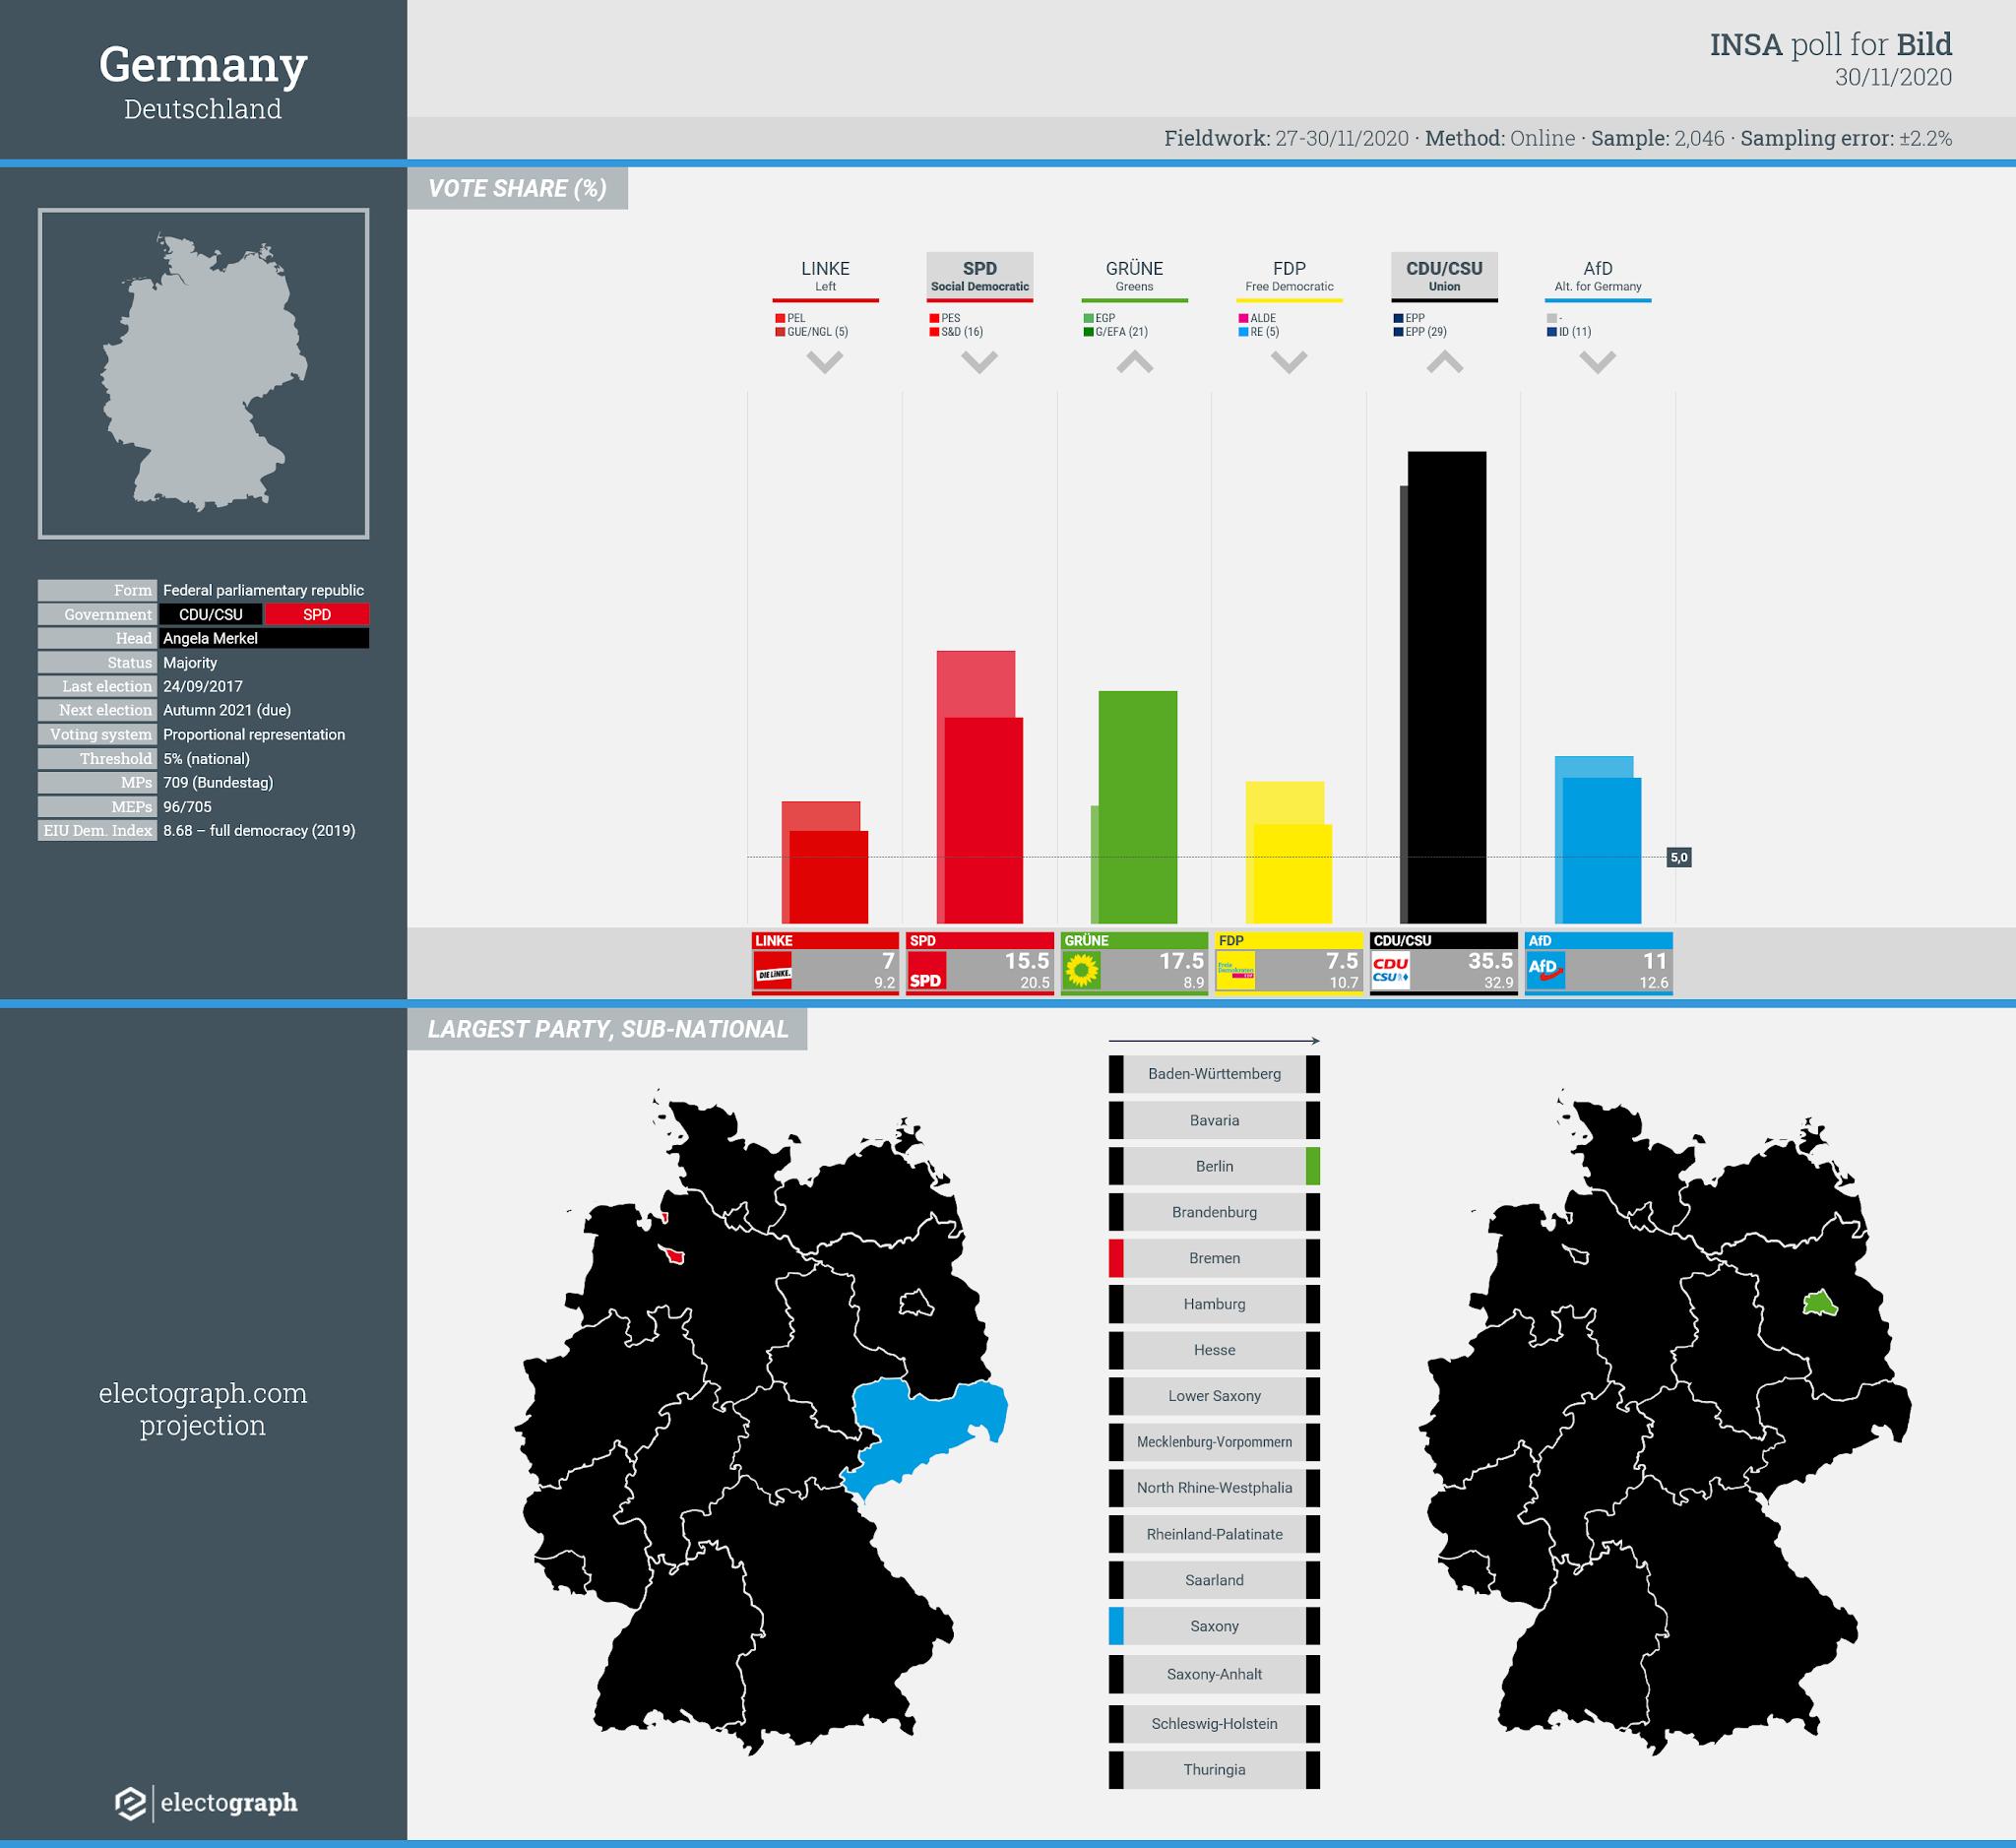 GERMANY: INSA poll chart for Bild, 30 November 2020